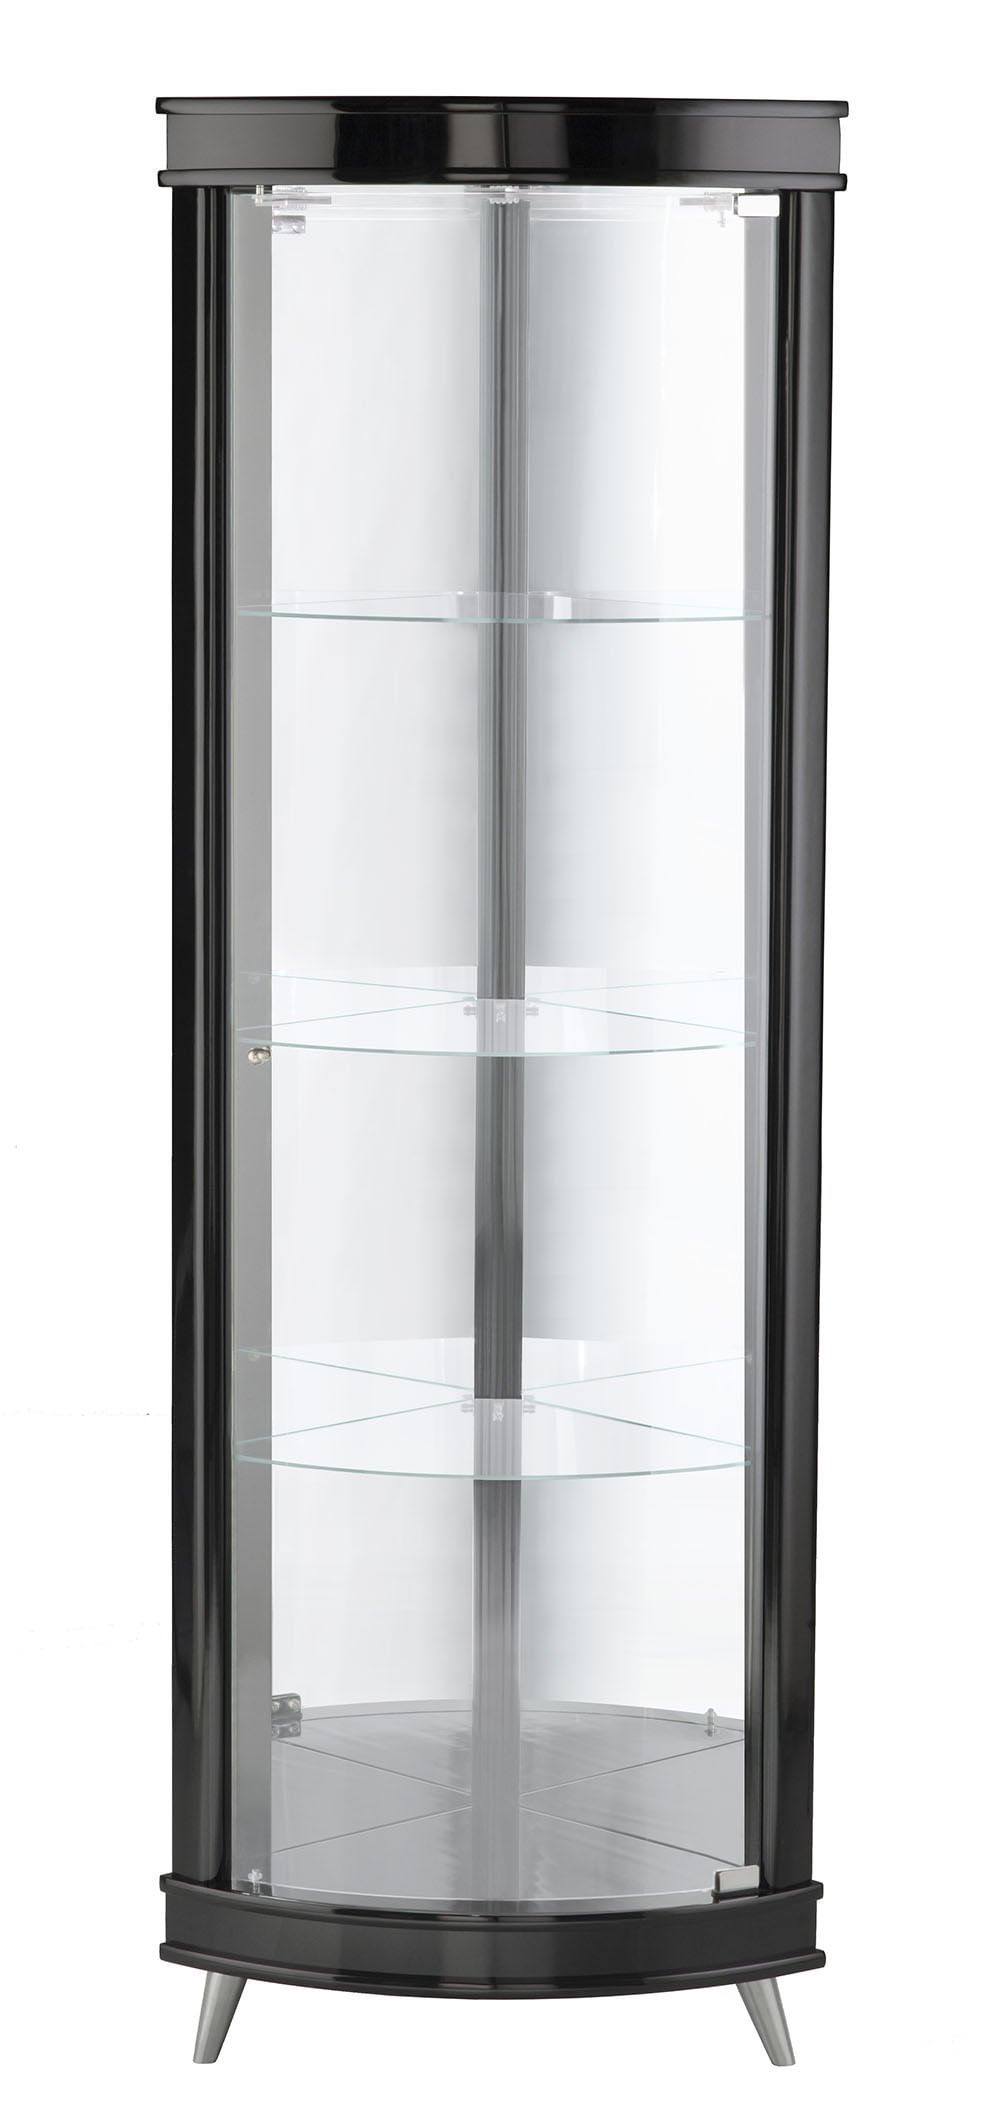 Cristaleira Corner Cor Laca Preto Semi-Brilho 43 cm (LARG) - 37350